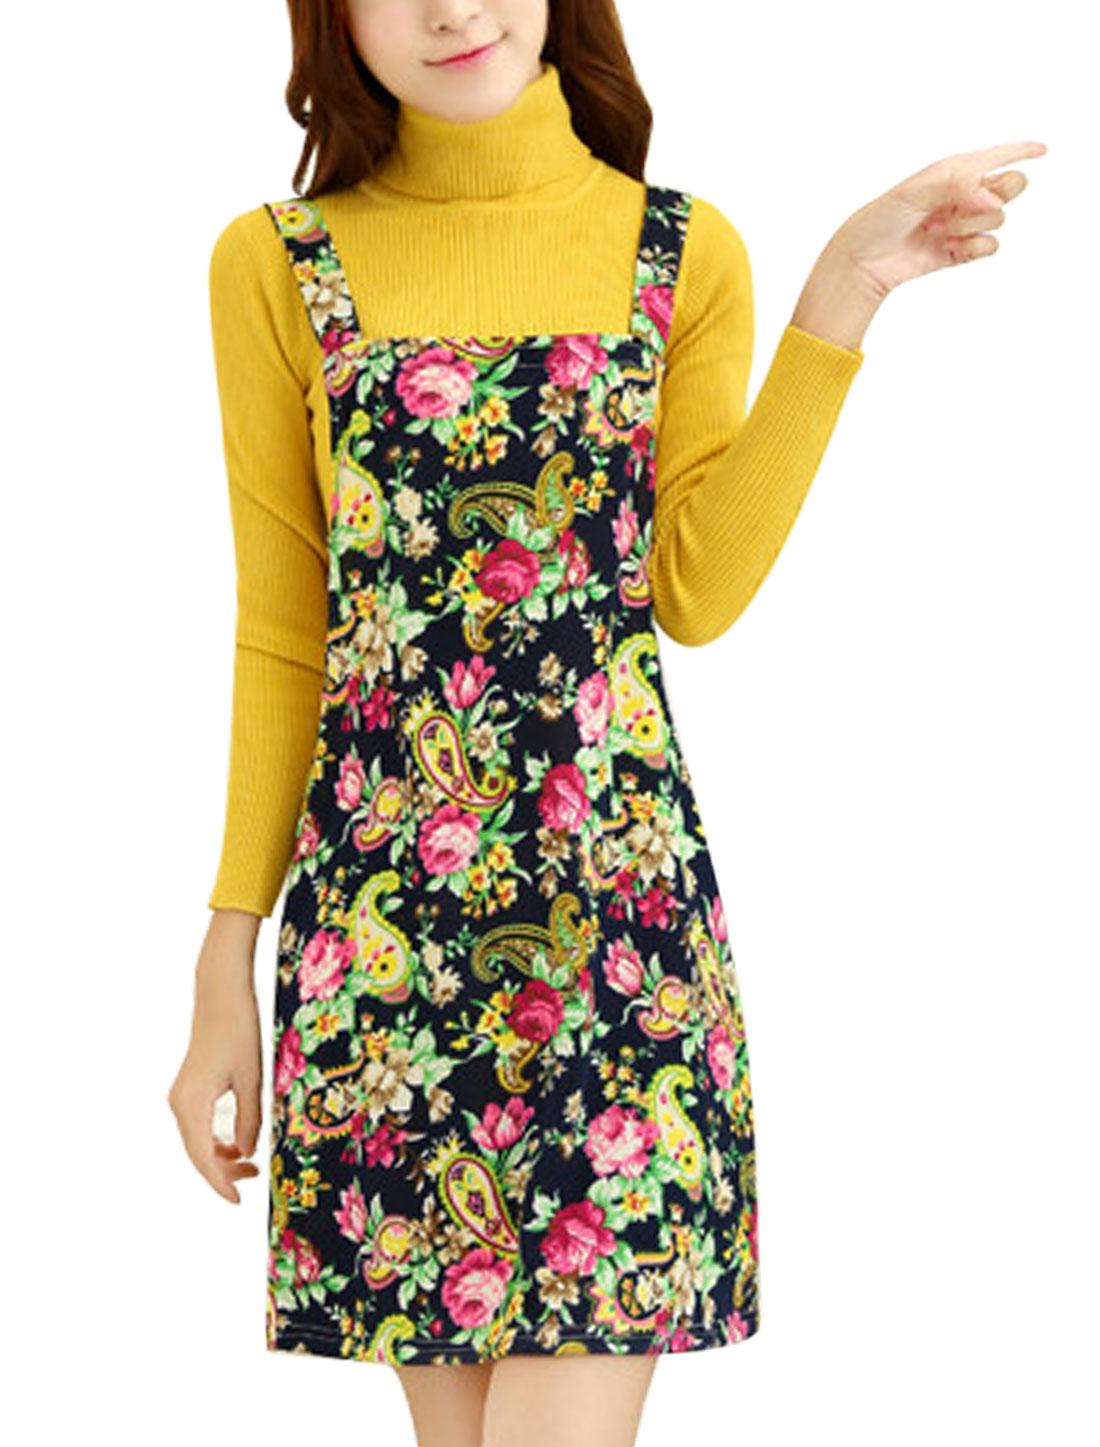 Women Floral Prints Sleeveless Straps Leisure Knit Suspender Dress Navy Blue M